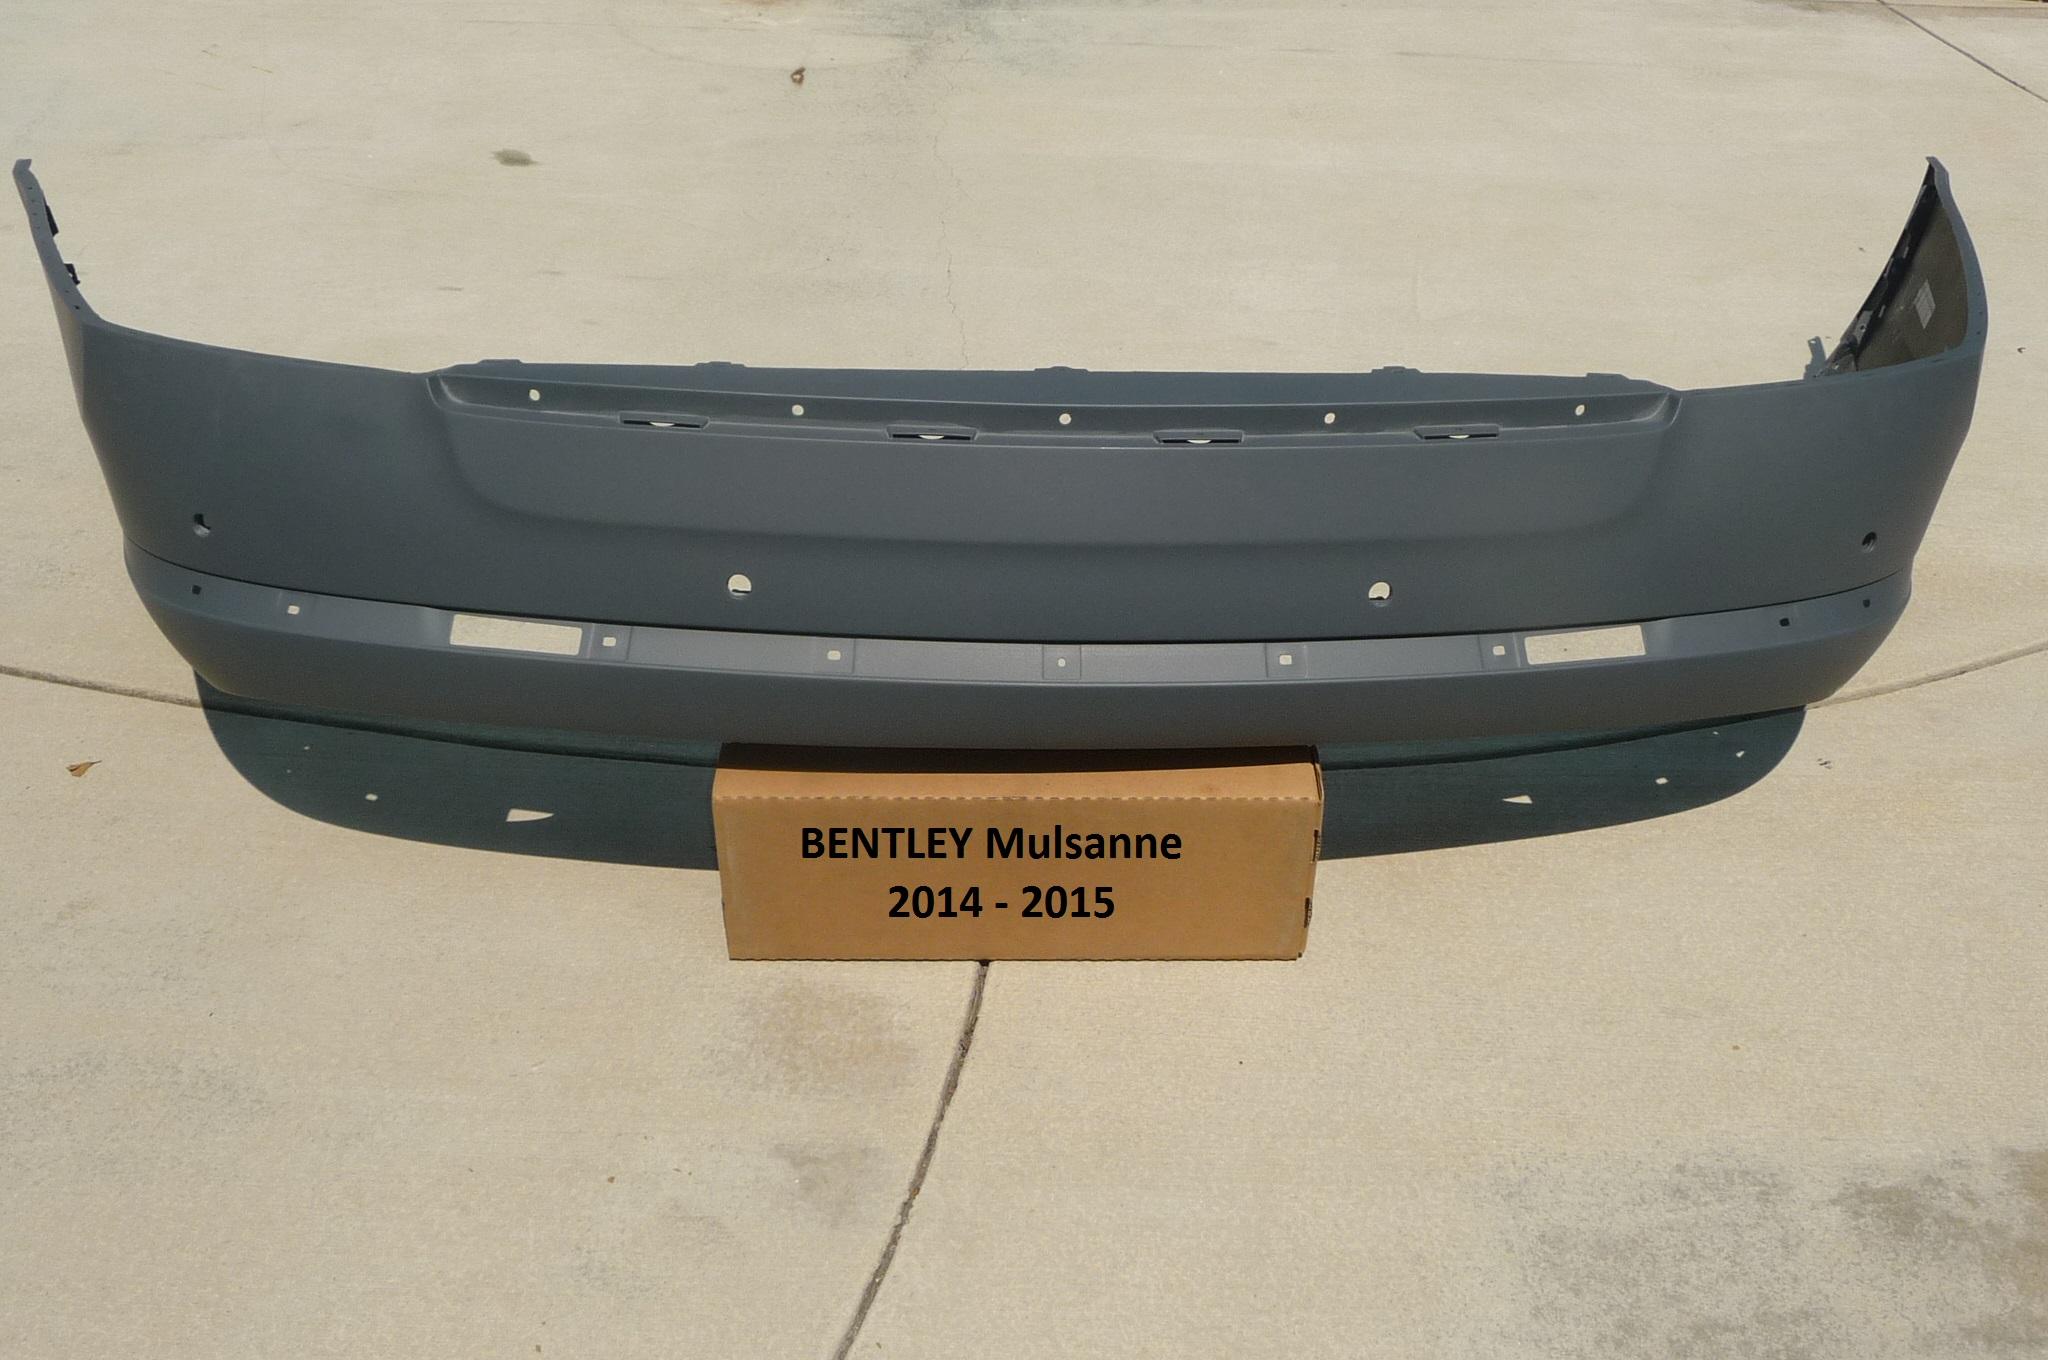 "2011 2012 2013 2014 2015 2016 Bentley Mulsanne Rear Bumper Cover ""Remaufactured"" 3Y0807421 OEM OE"